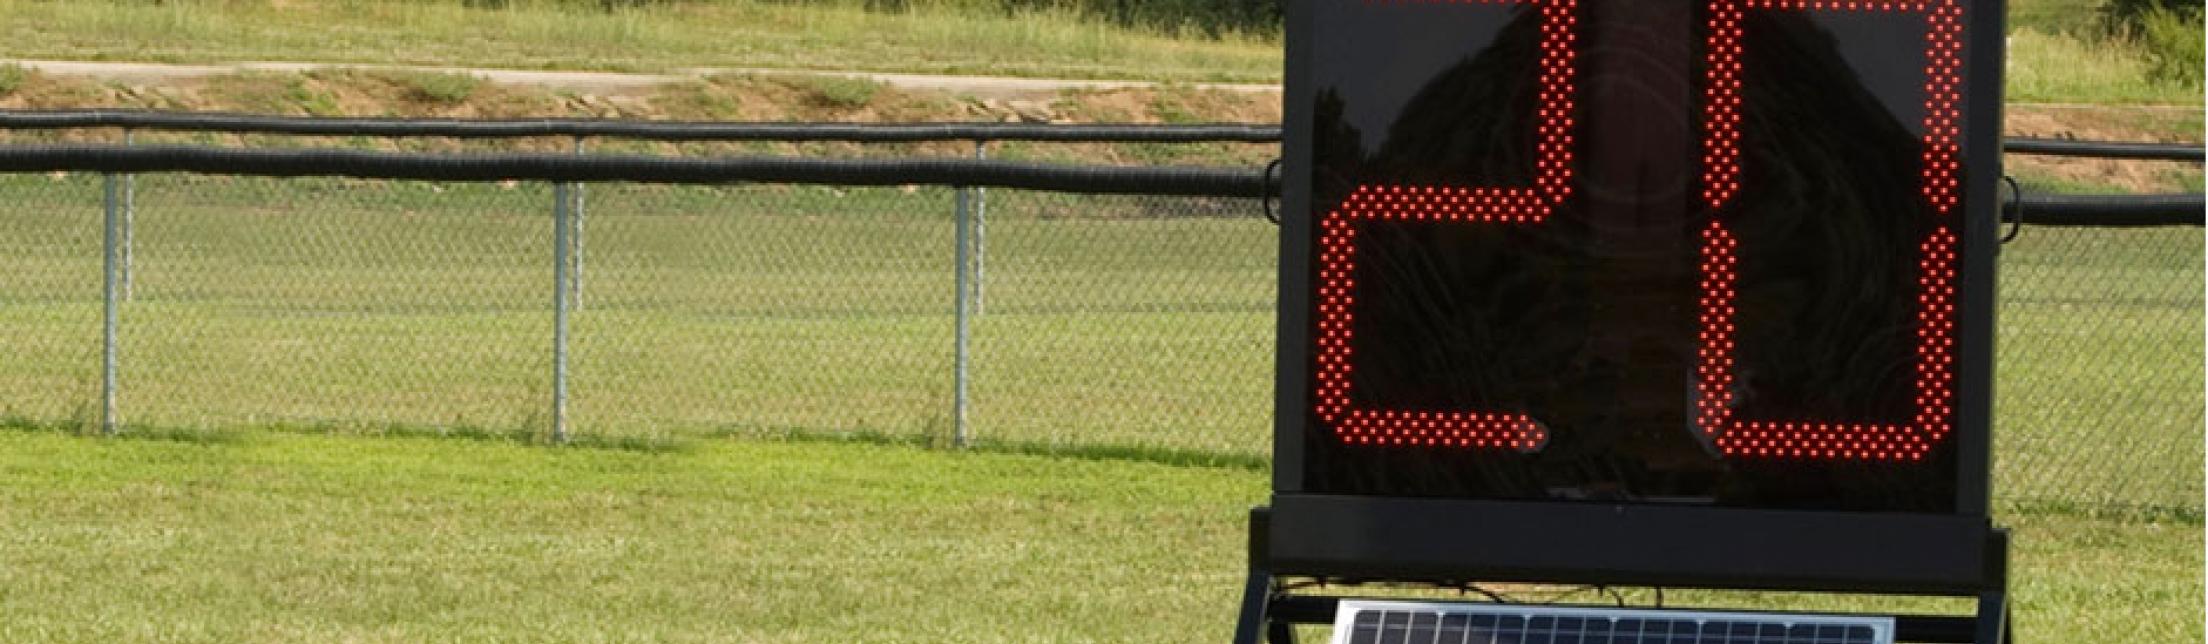 play clock walled on trailer solar